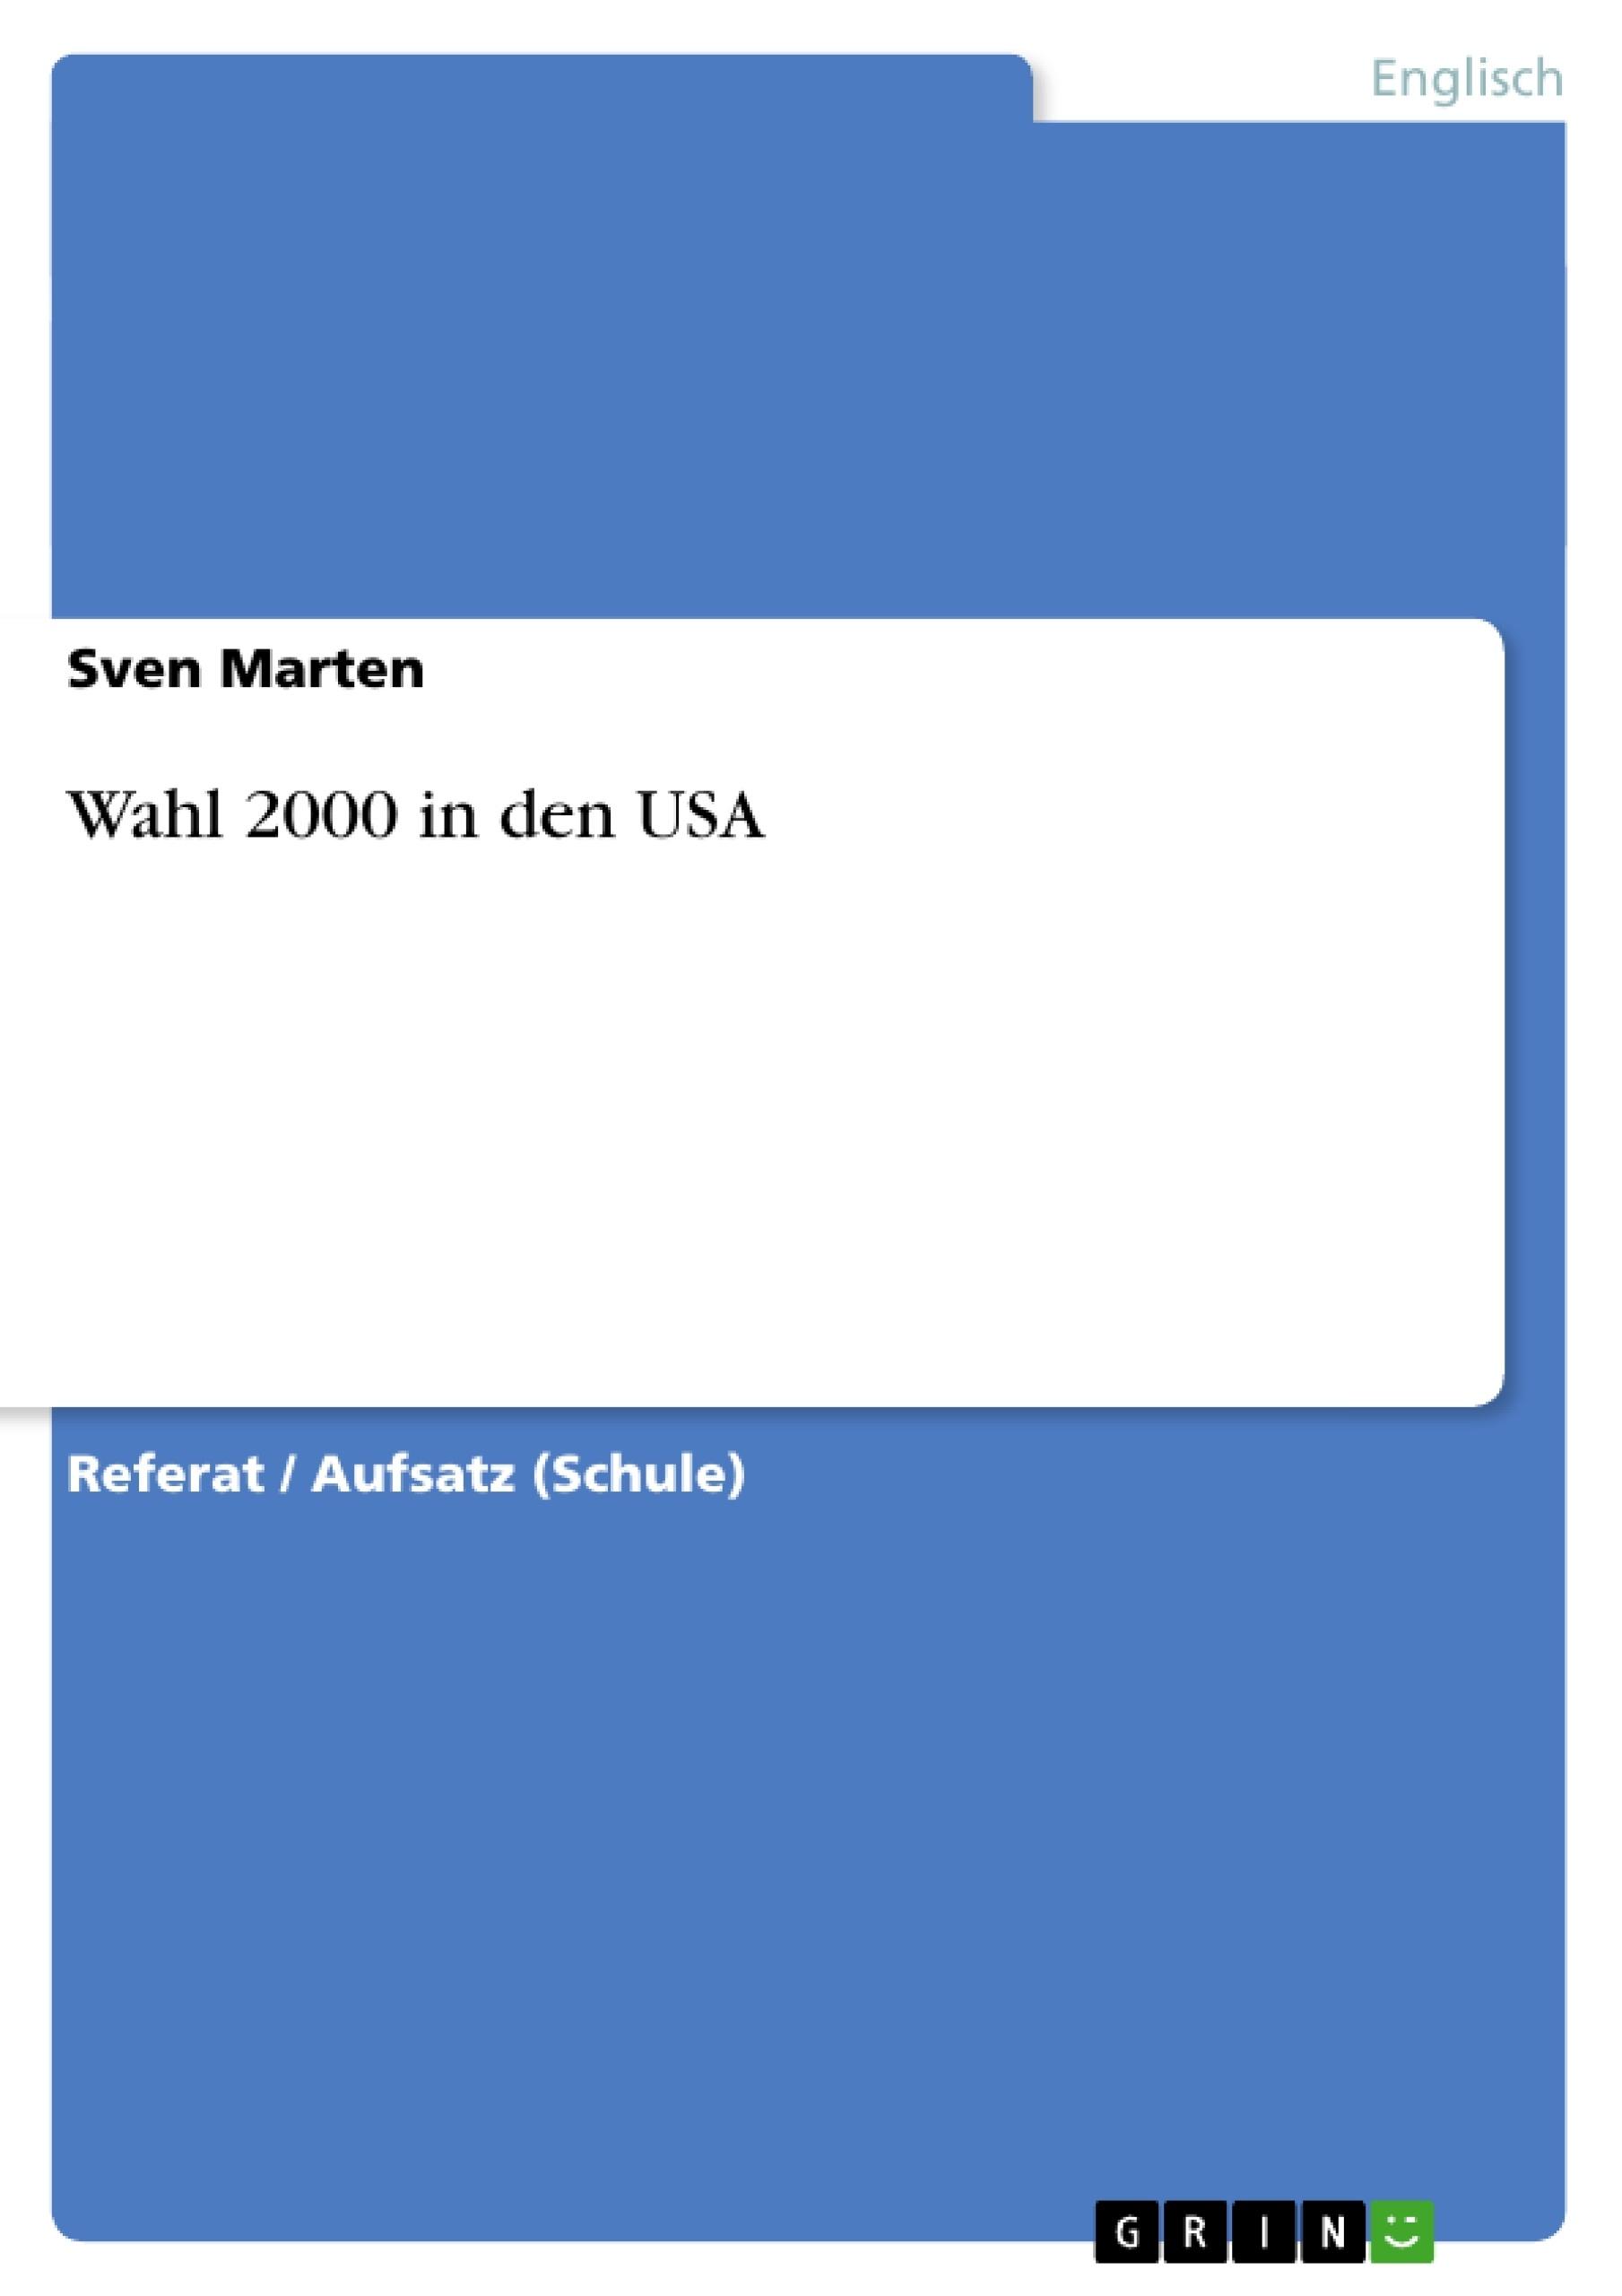 usa wahl 2000